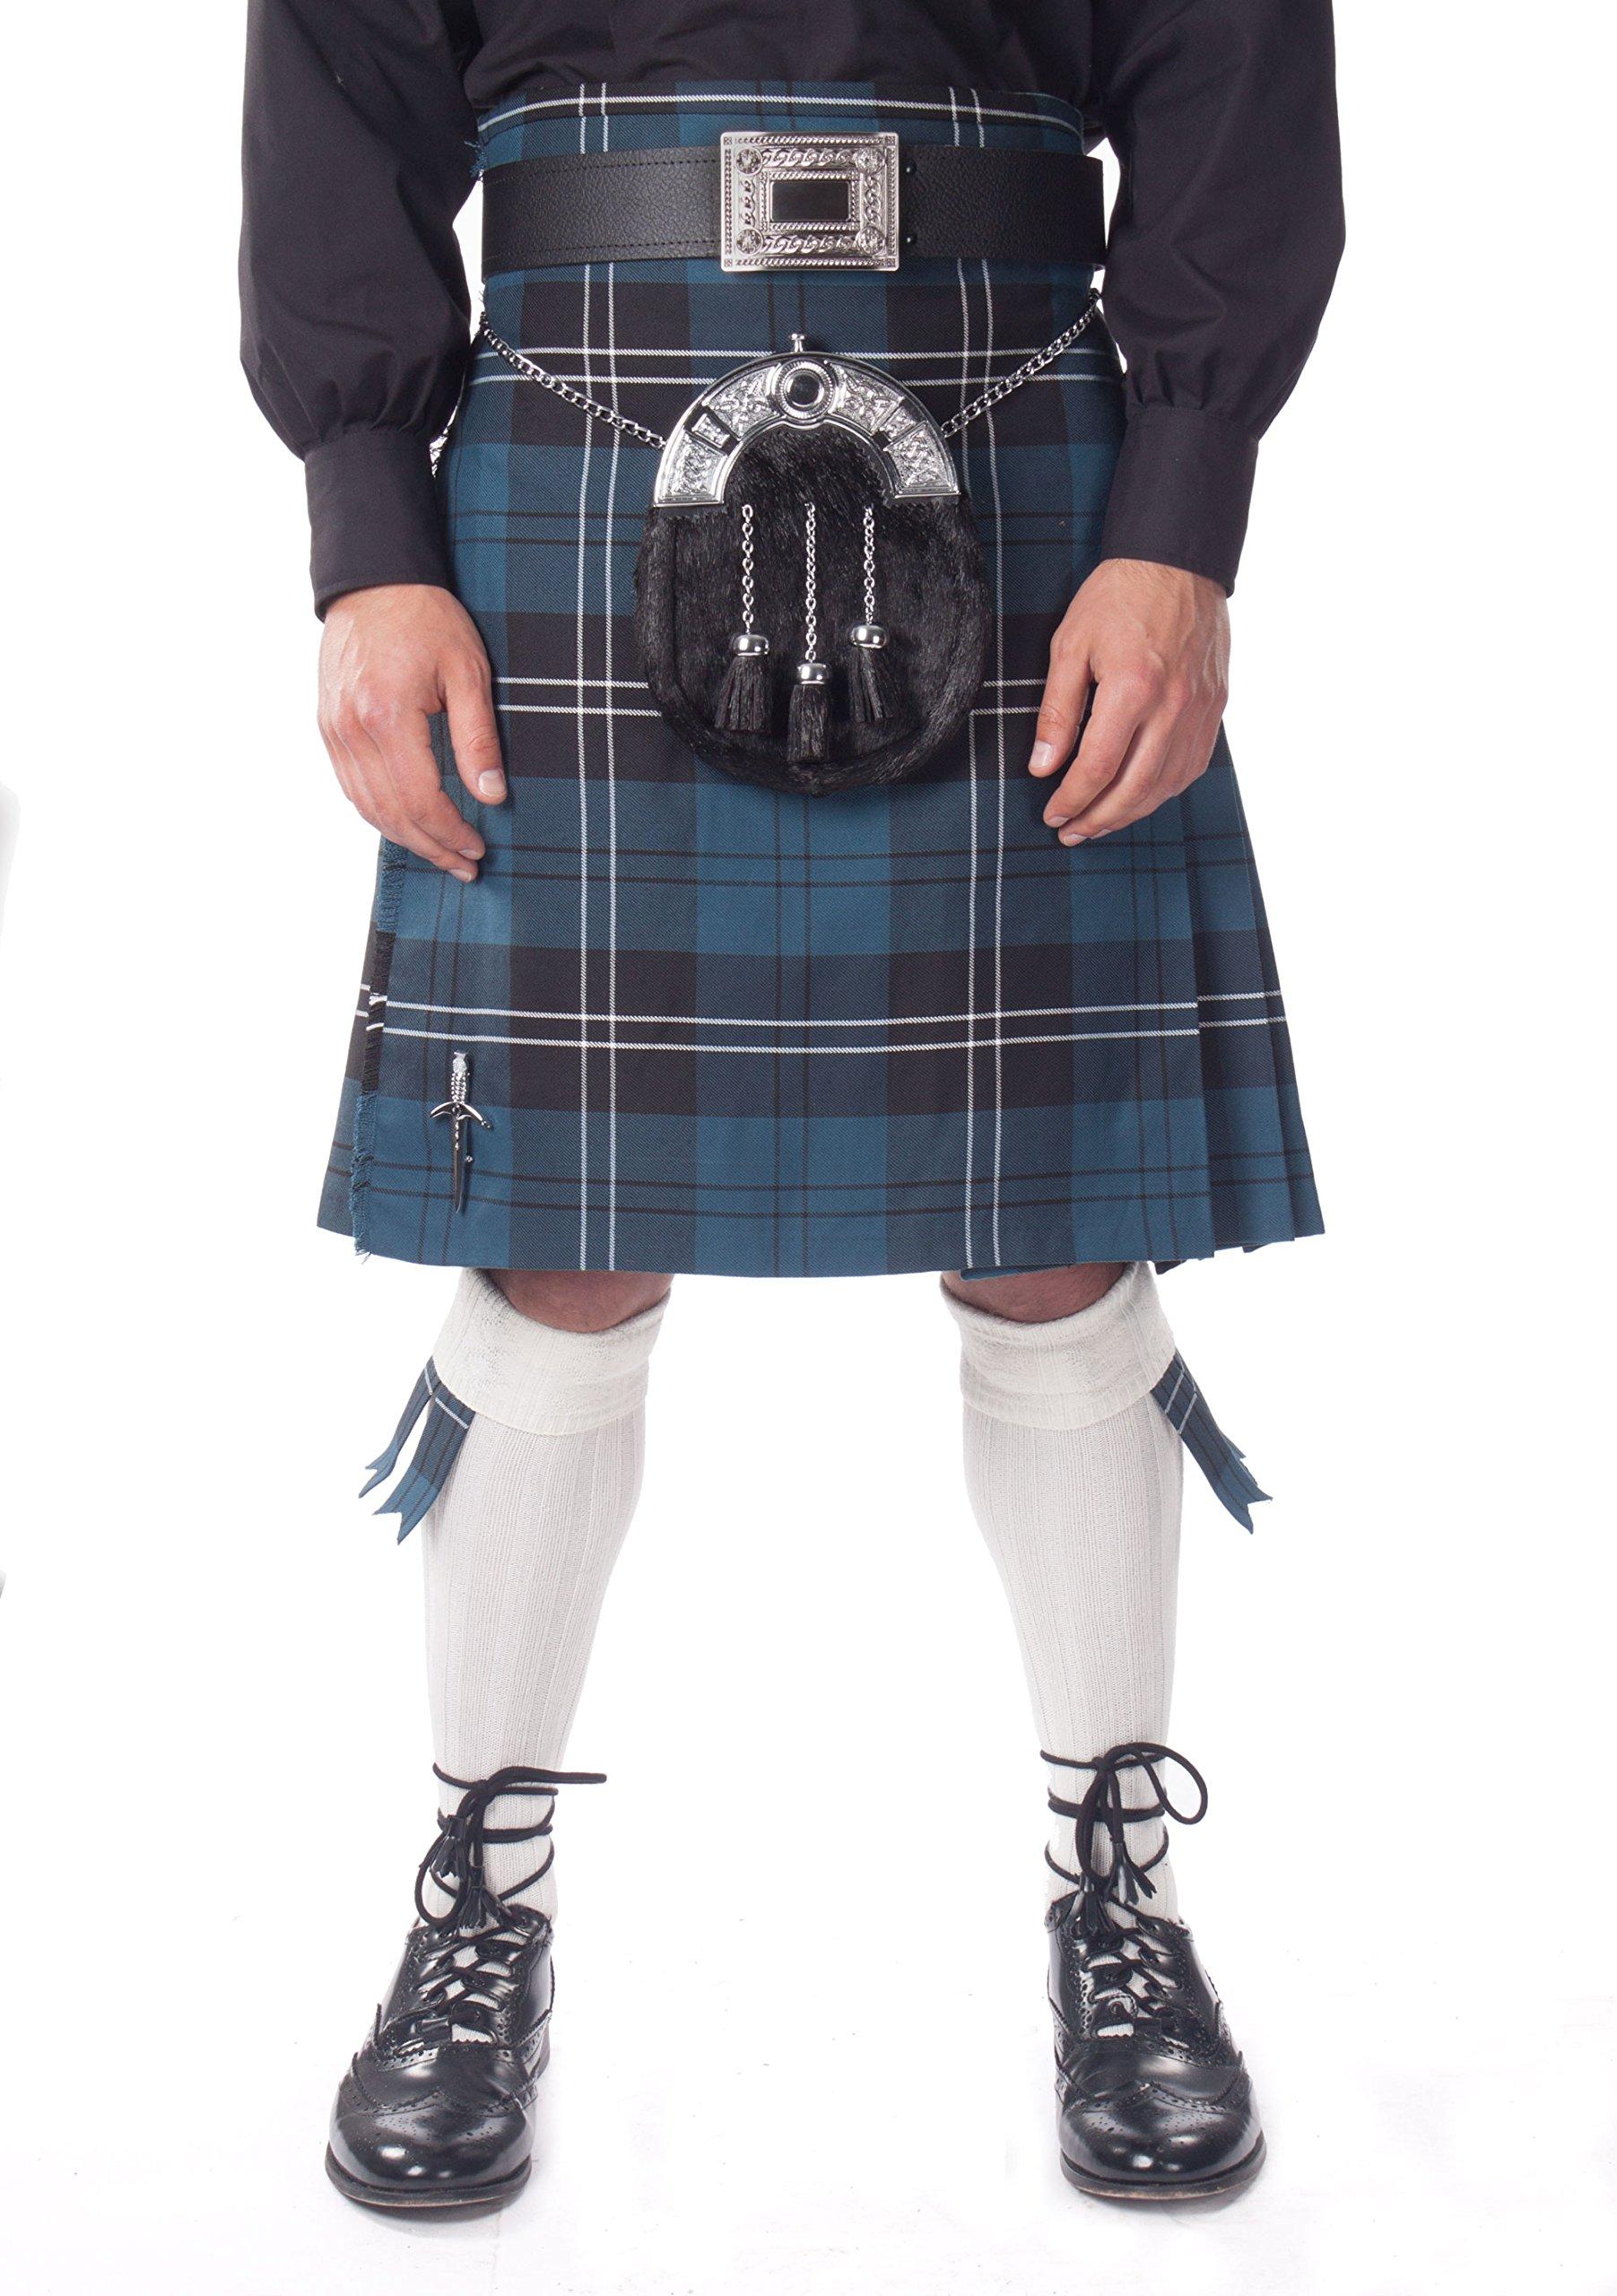 Kilt Society Mens 7 Piece Full Dress Kilt Outfit- Ramsay Blue Tartan with White Hose 34'' to 38'' by Kilt Society